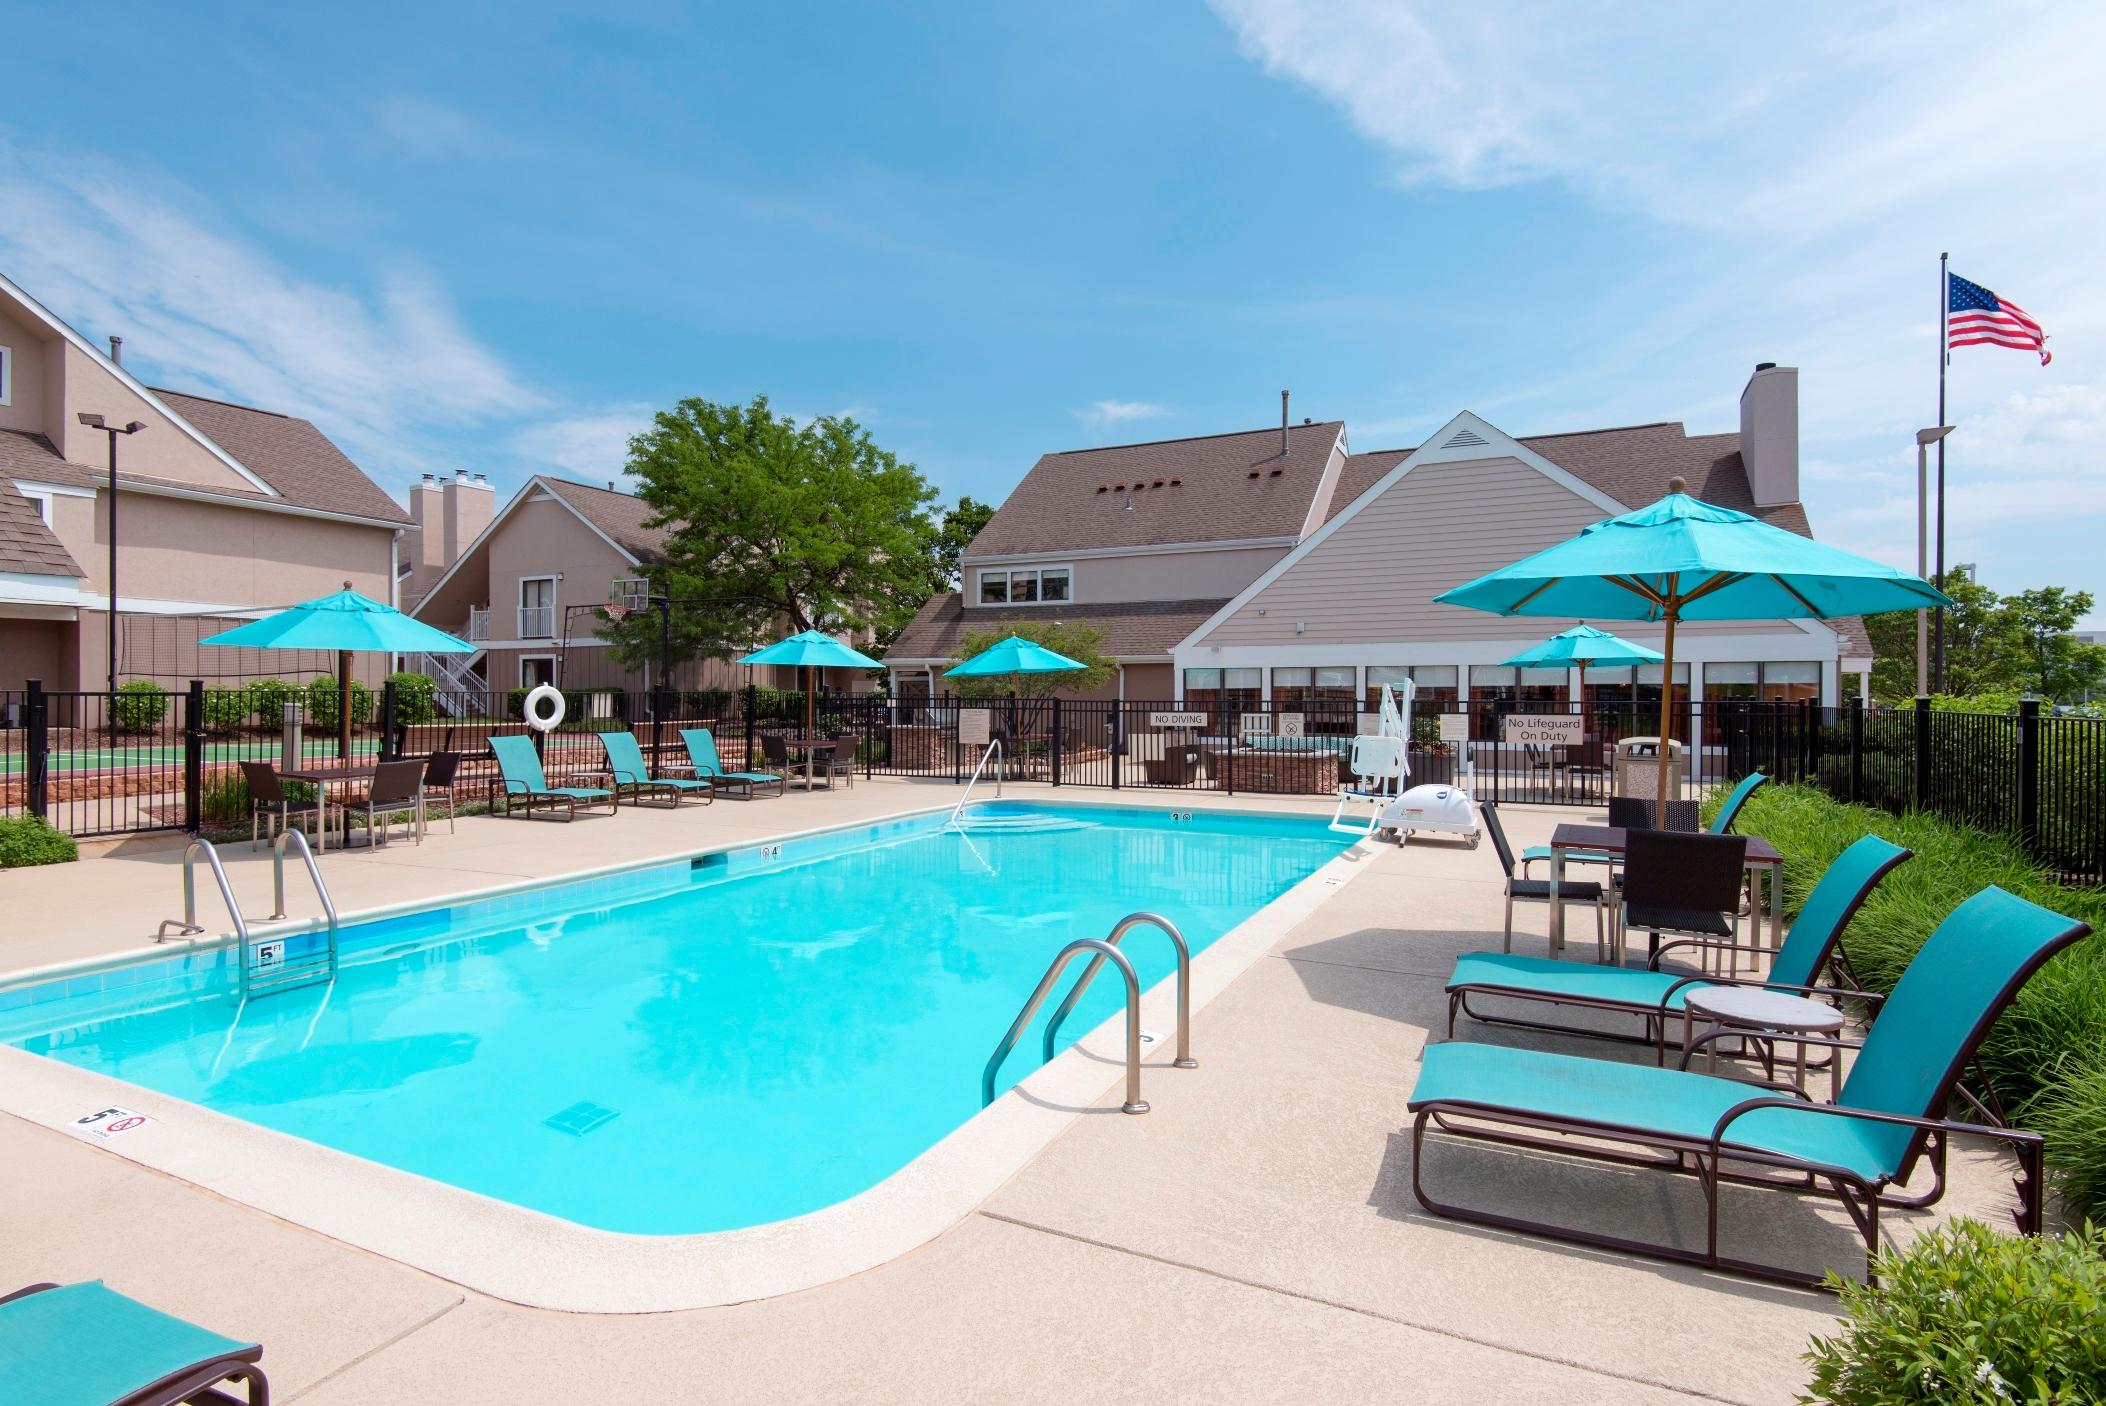 Residence Inn by Marriott Chicago Deerfield image 4